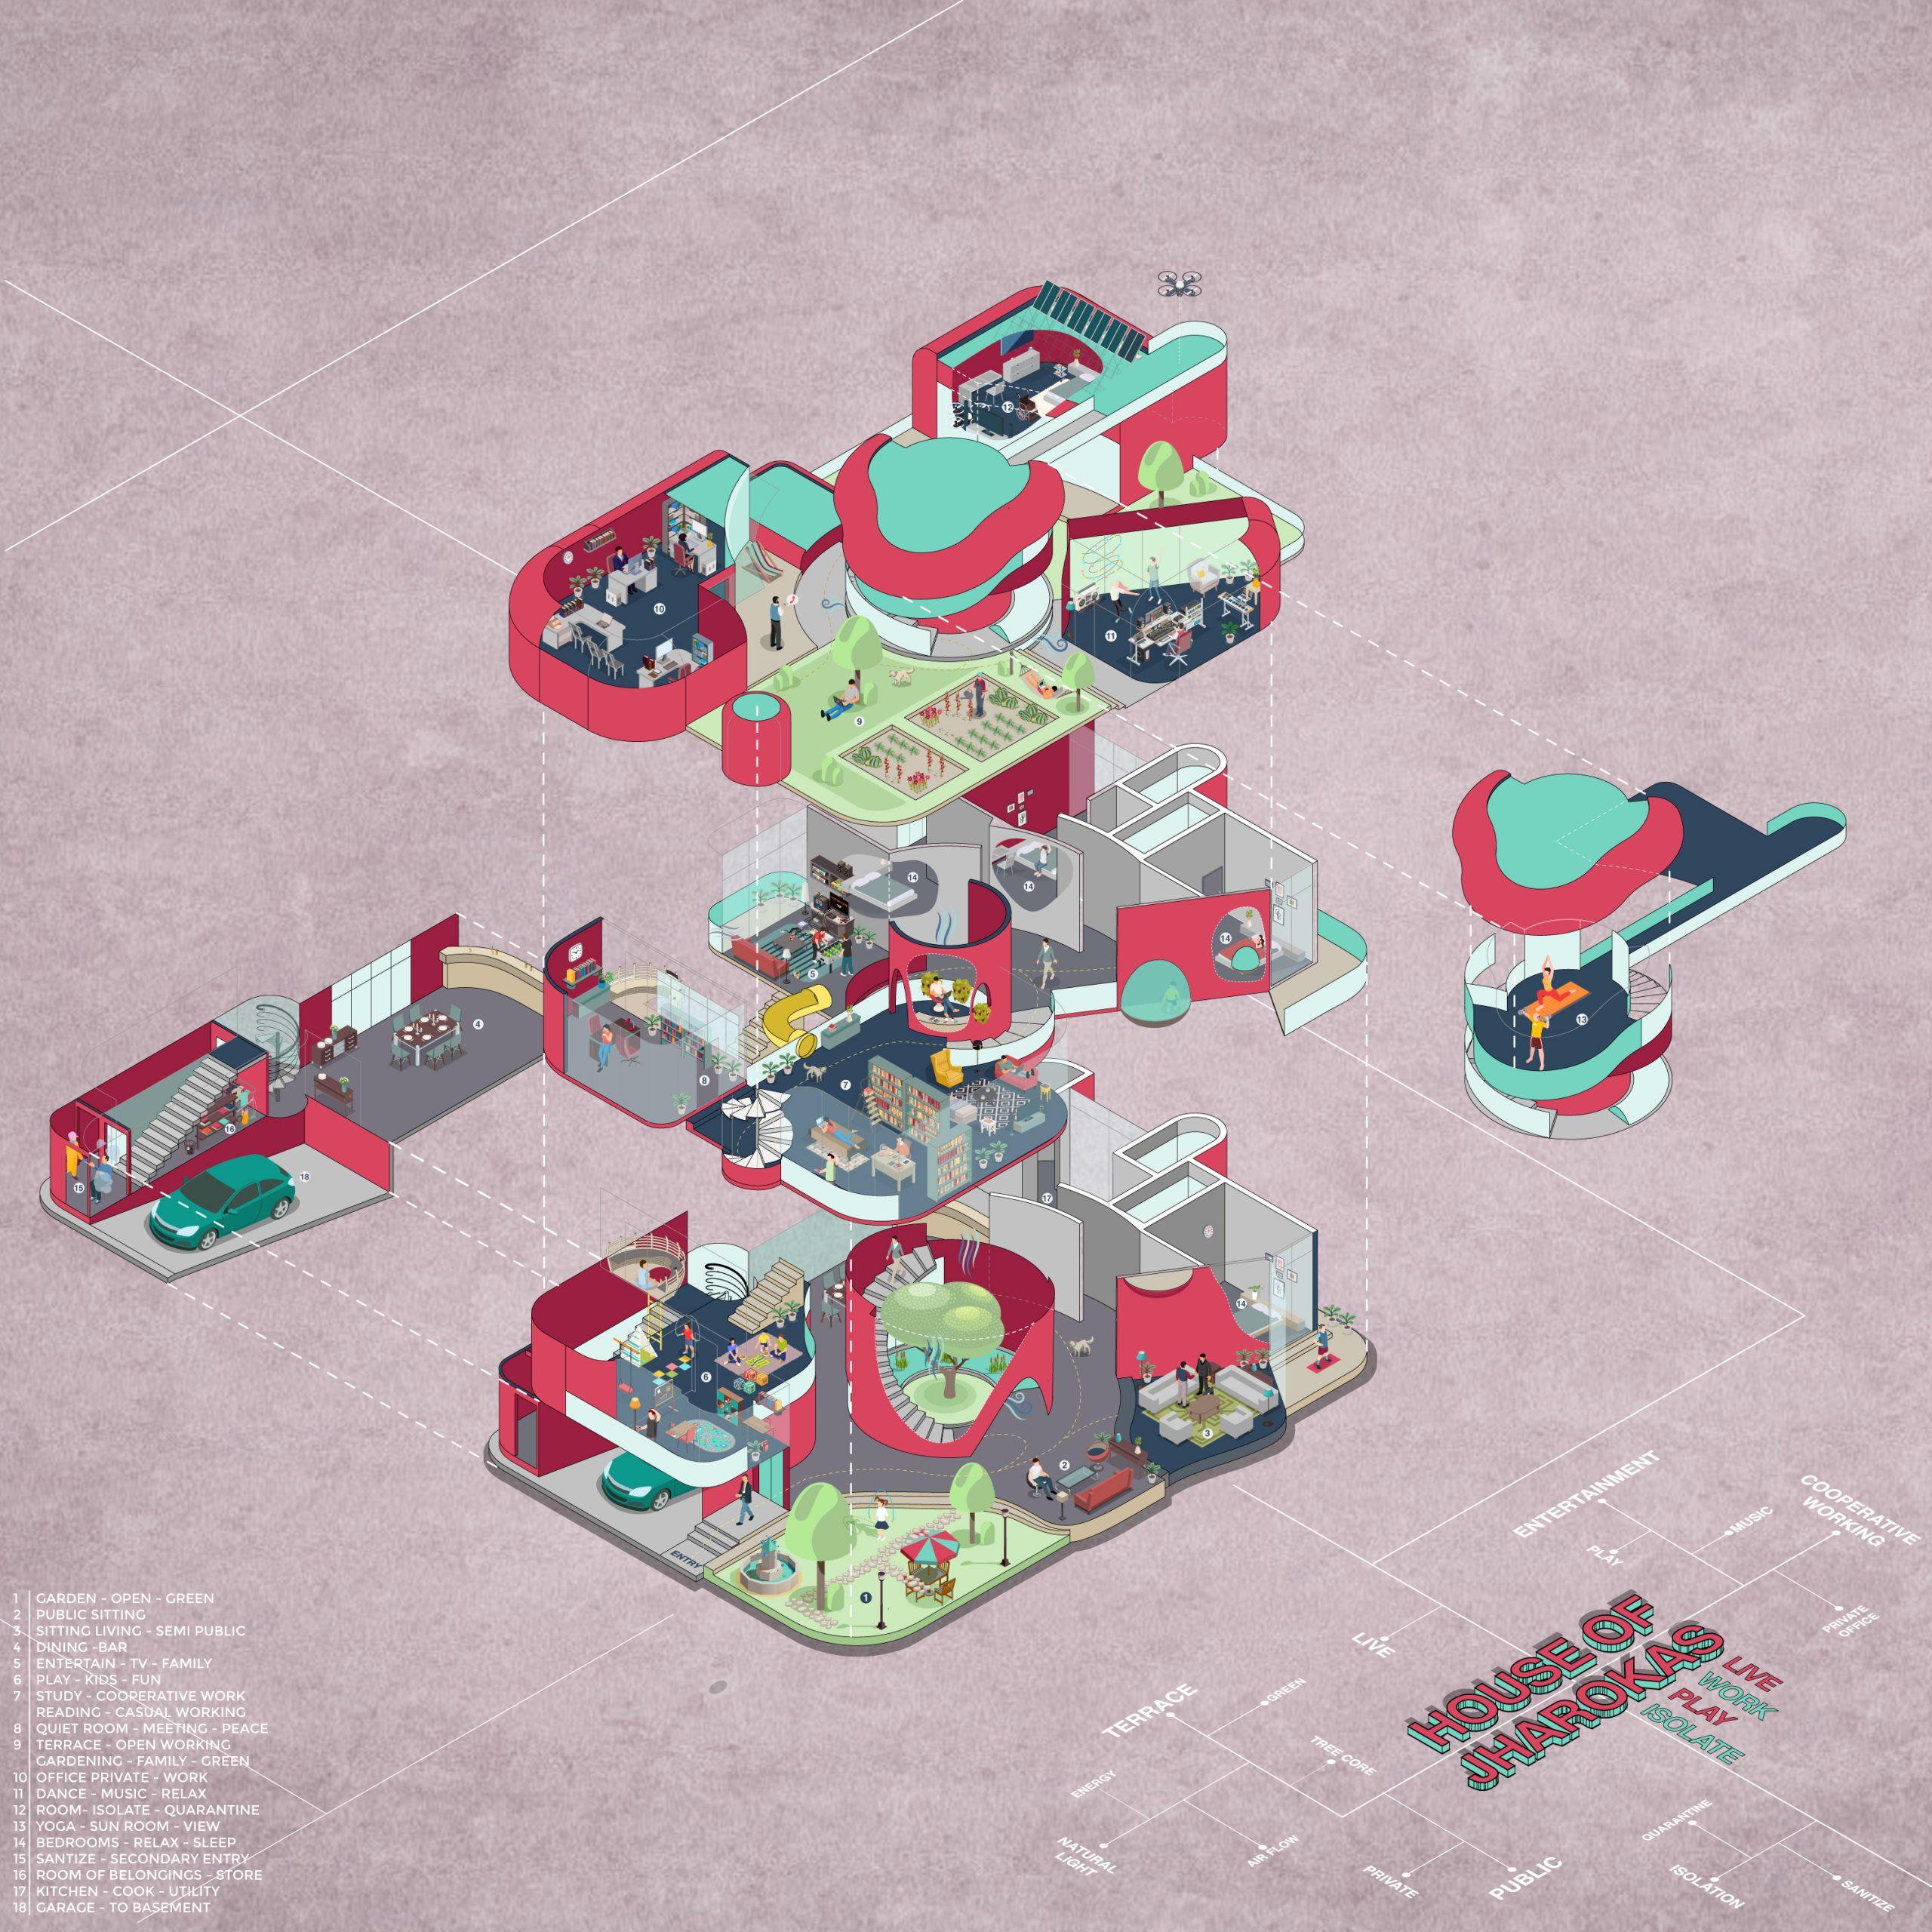 THE HOUSE OF JHAROKAS - by Ashish Rao & Maanit Bajaj